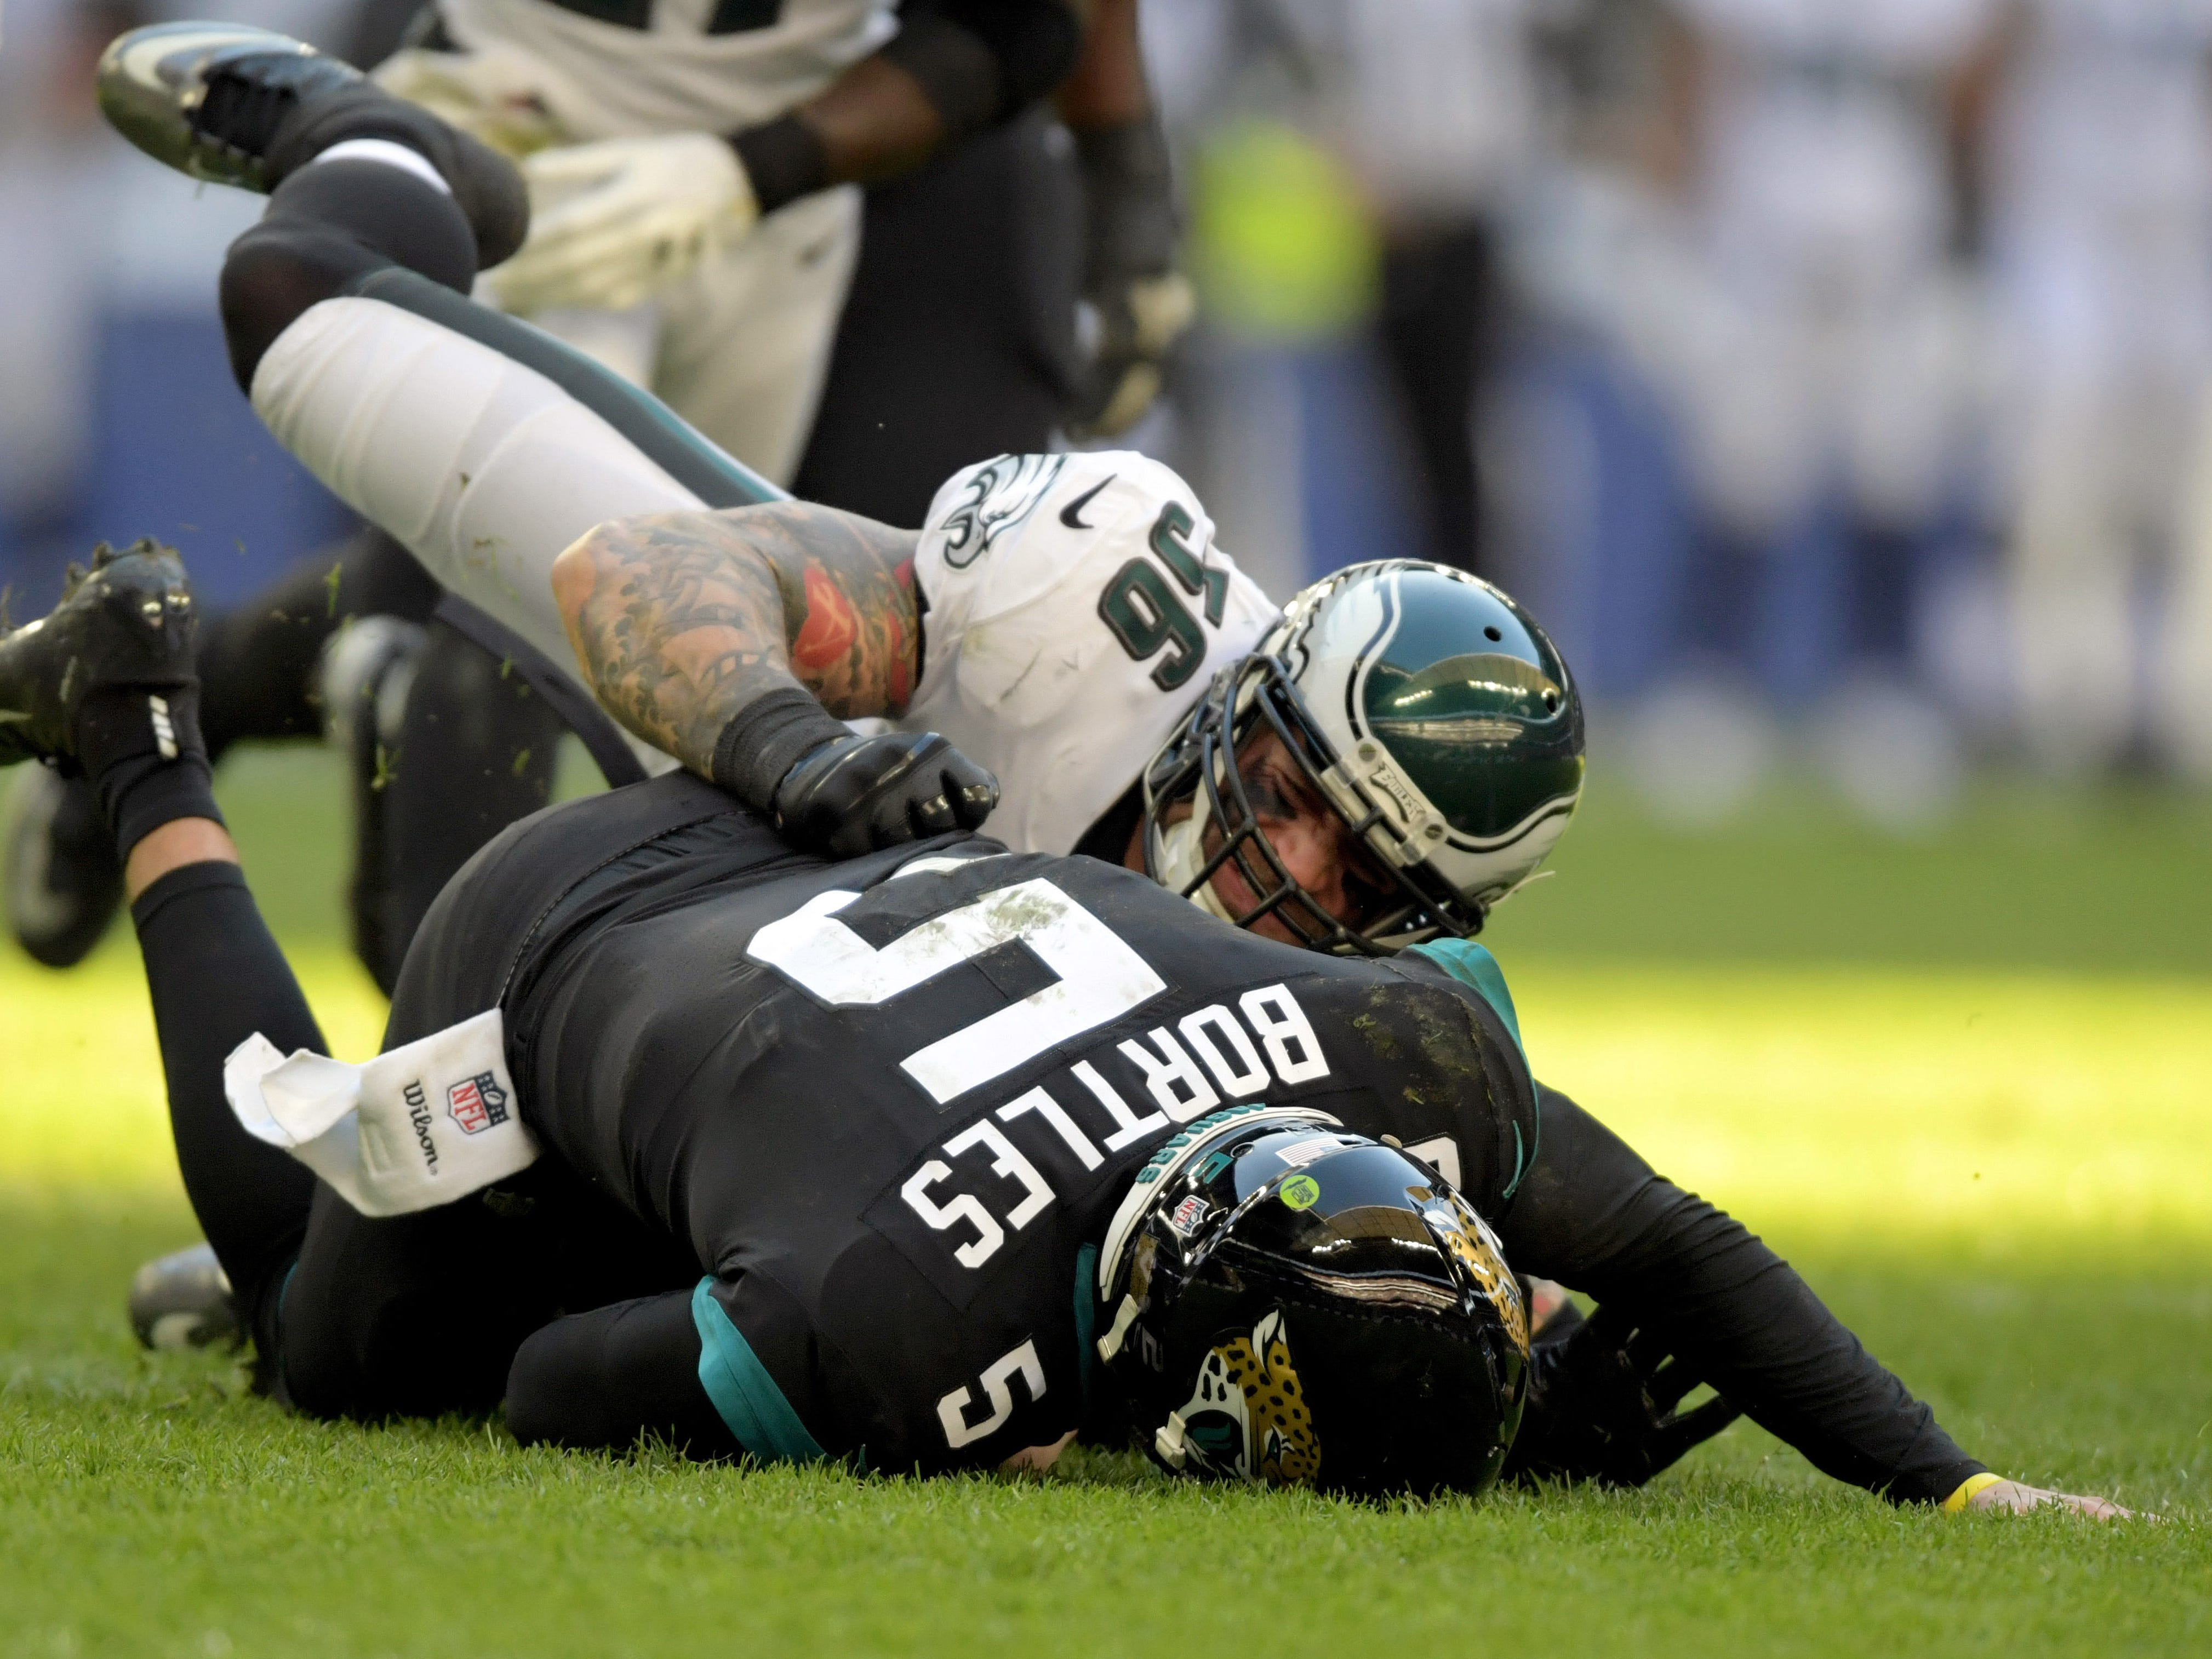 Philadelphia Eagles defensive end Chris Long (56) sakes Jacksonville Jaguars quarterback Blake Bortles (5) in the second quarter at Wembley Stadium.